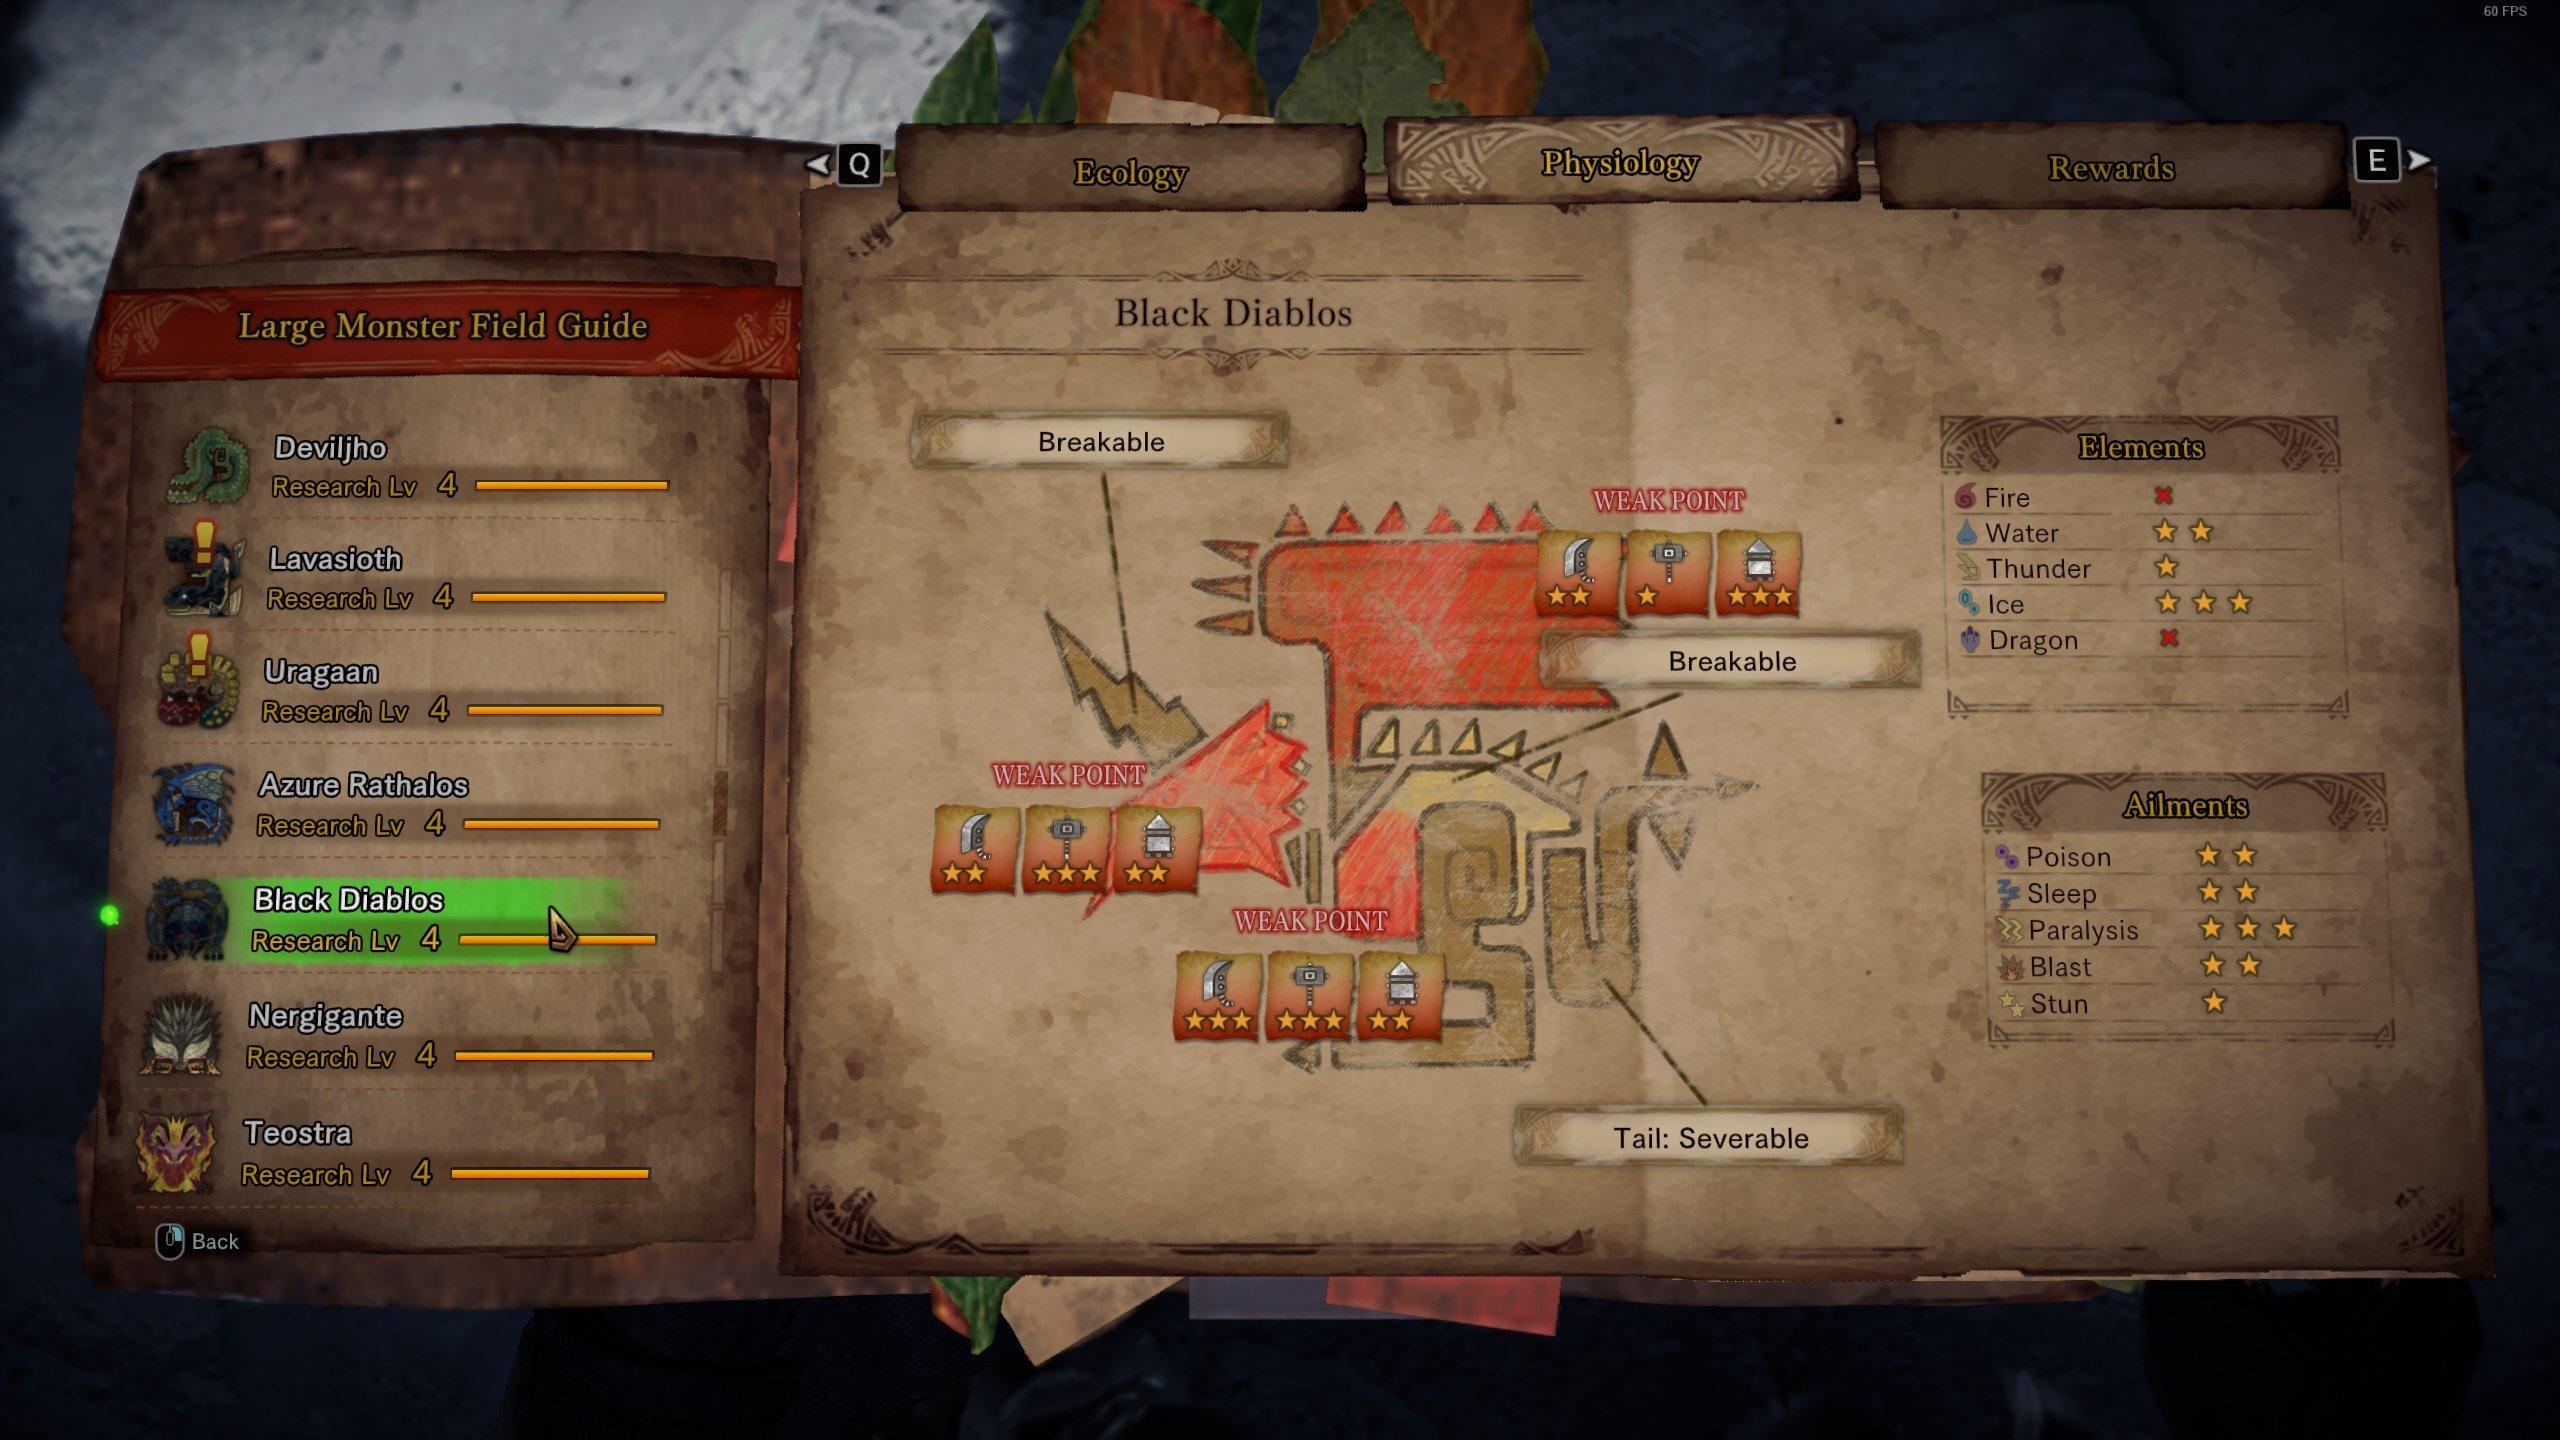 Mhw Black Diablos info